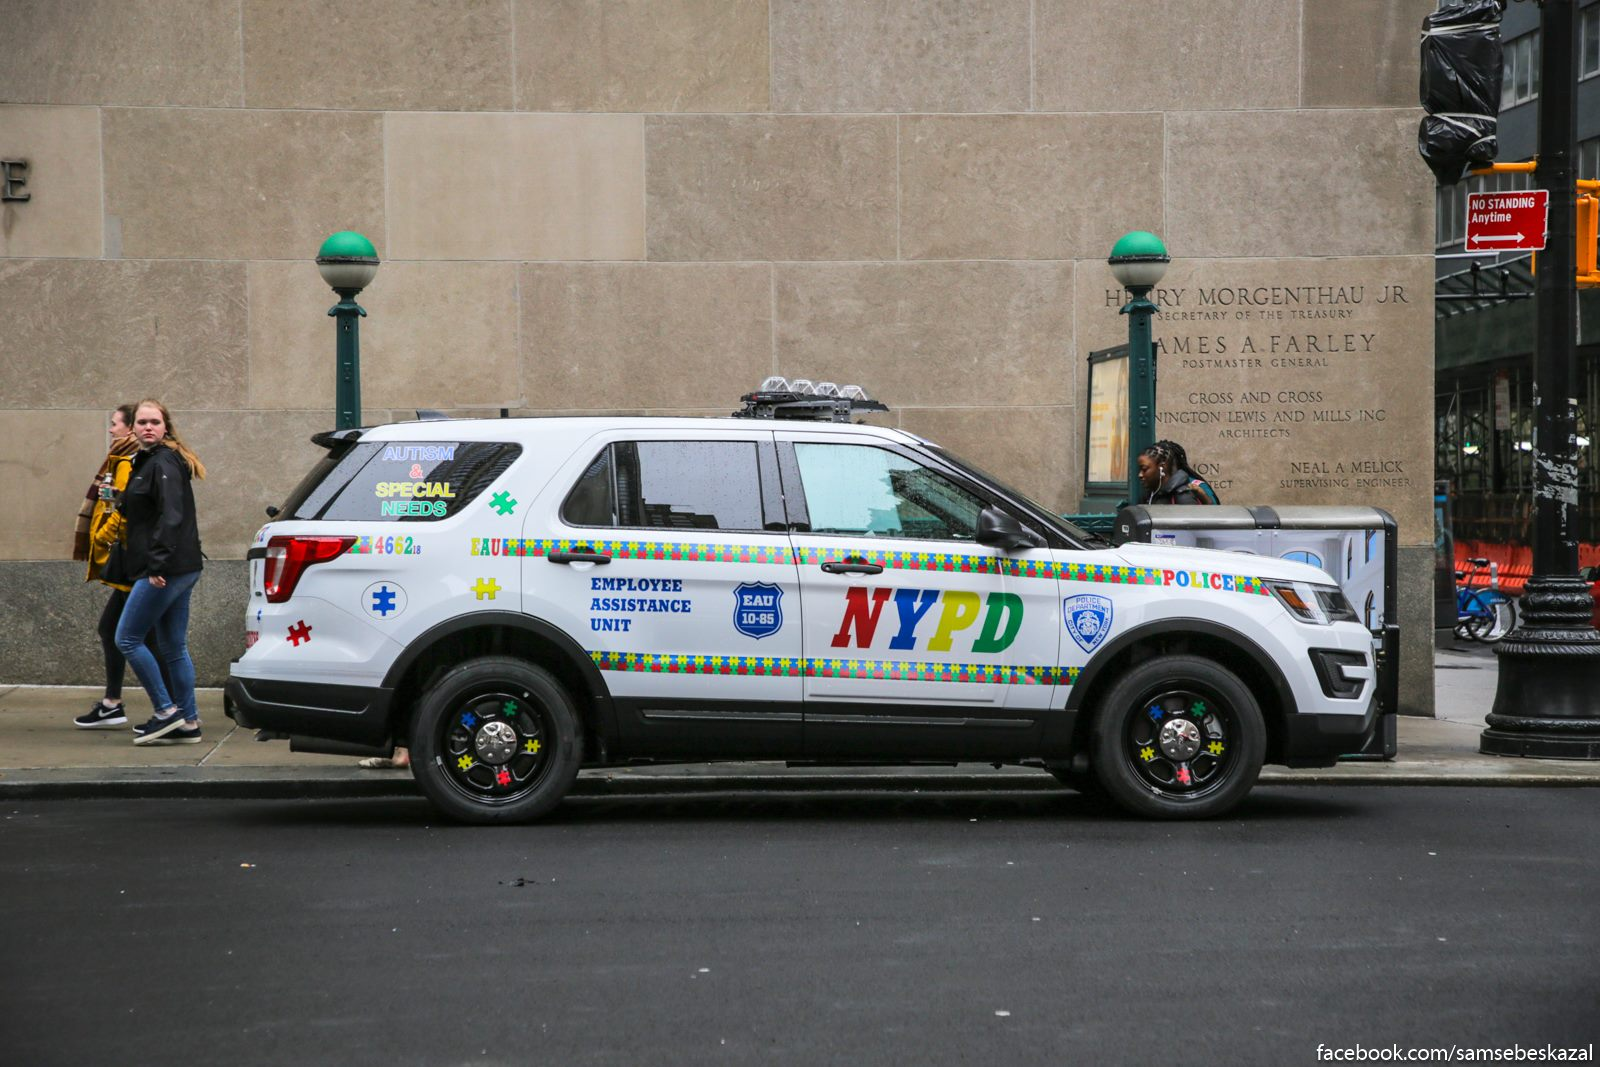 Masina nʹu-jorkskoj policii iz podrazdelenia podderzki sotrudnikov, kuda te obrasautsa v tom cisle i za pomosʹu v borʹbe so stressom i psihologiceskoj razgruzkoj.